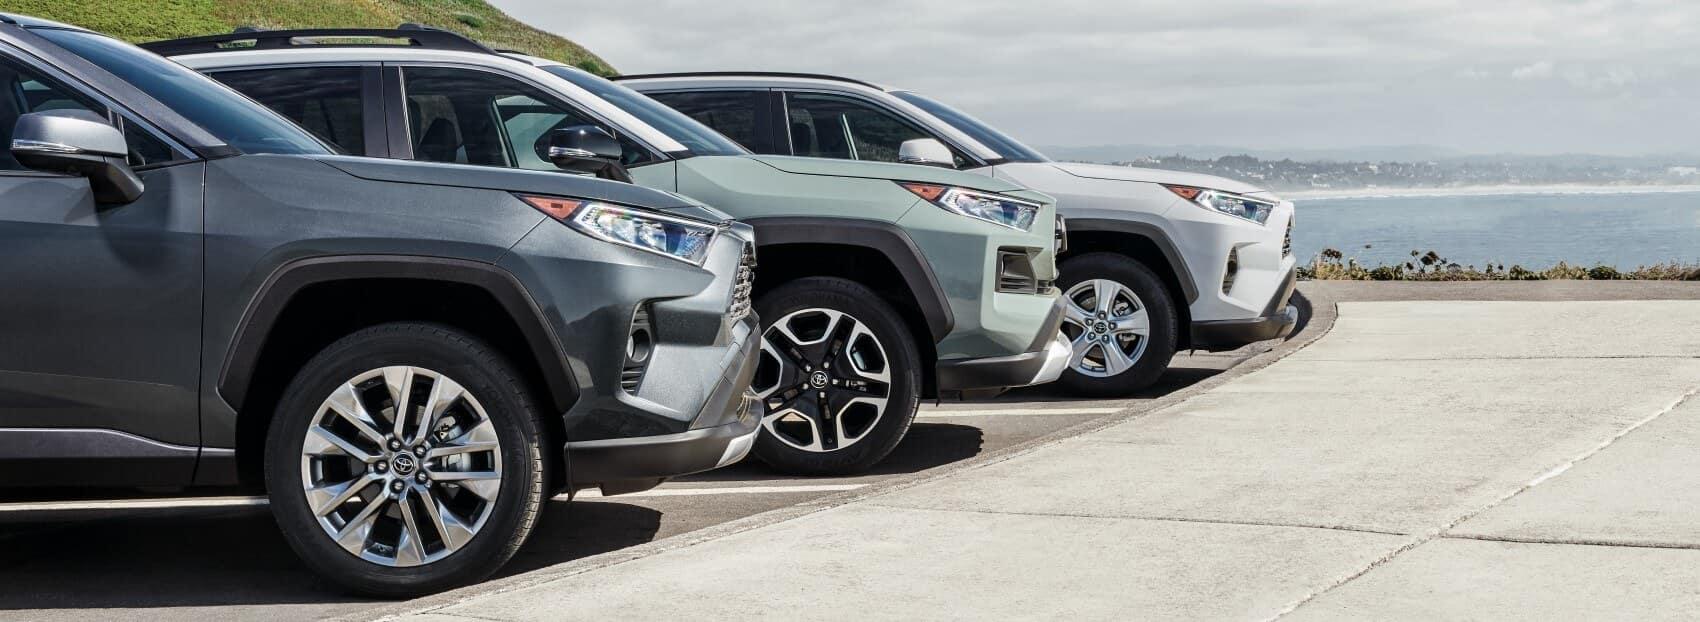 Toyota RAV4 Dashboard Lights